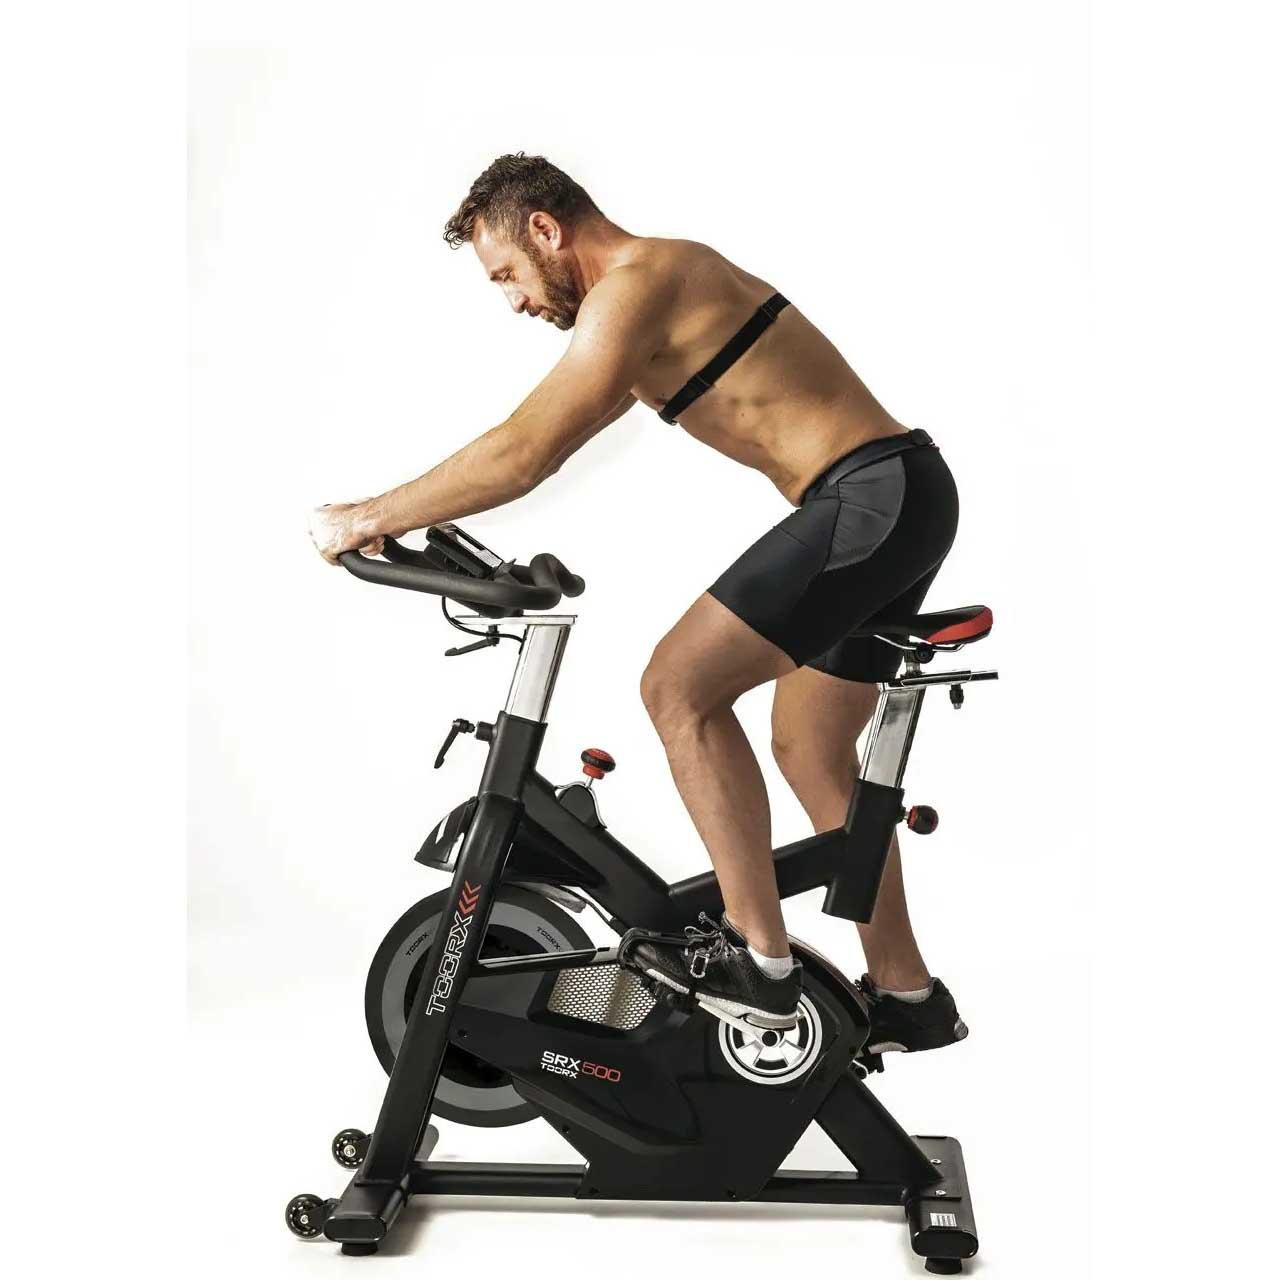 TOORX SRX 500 Spin bike magnetica